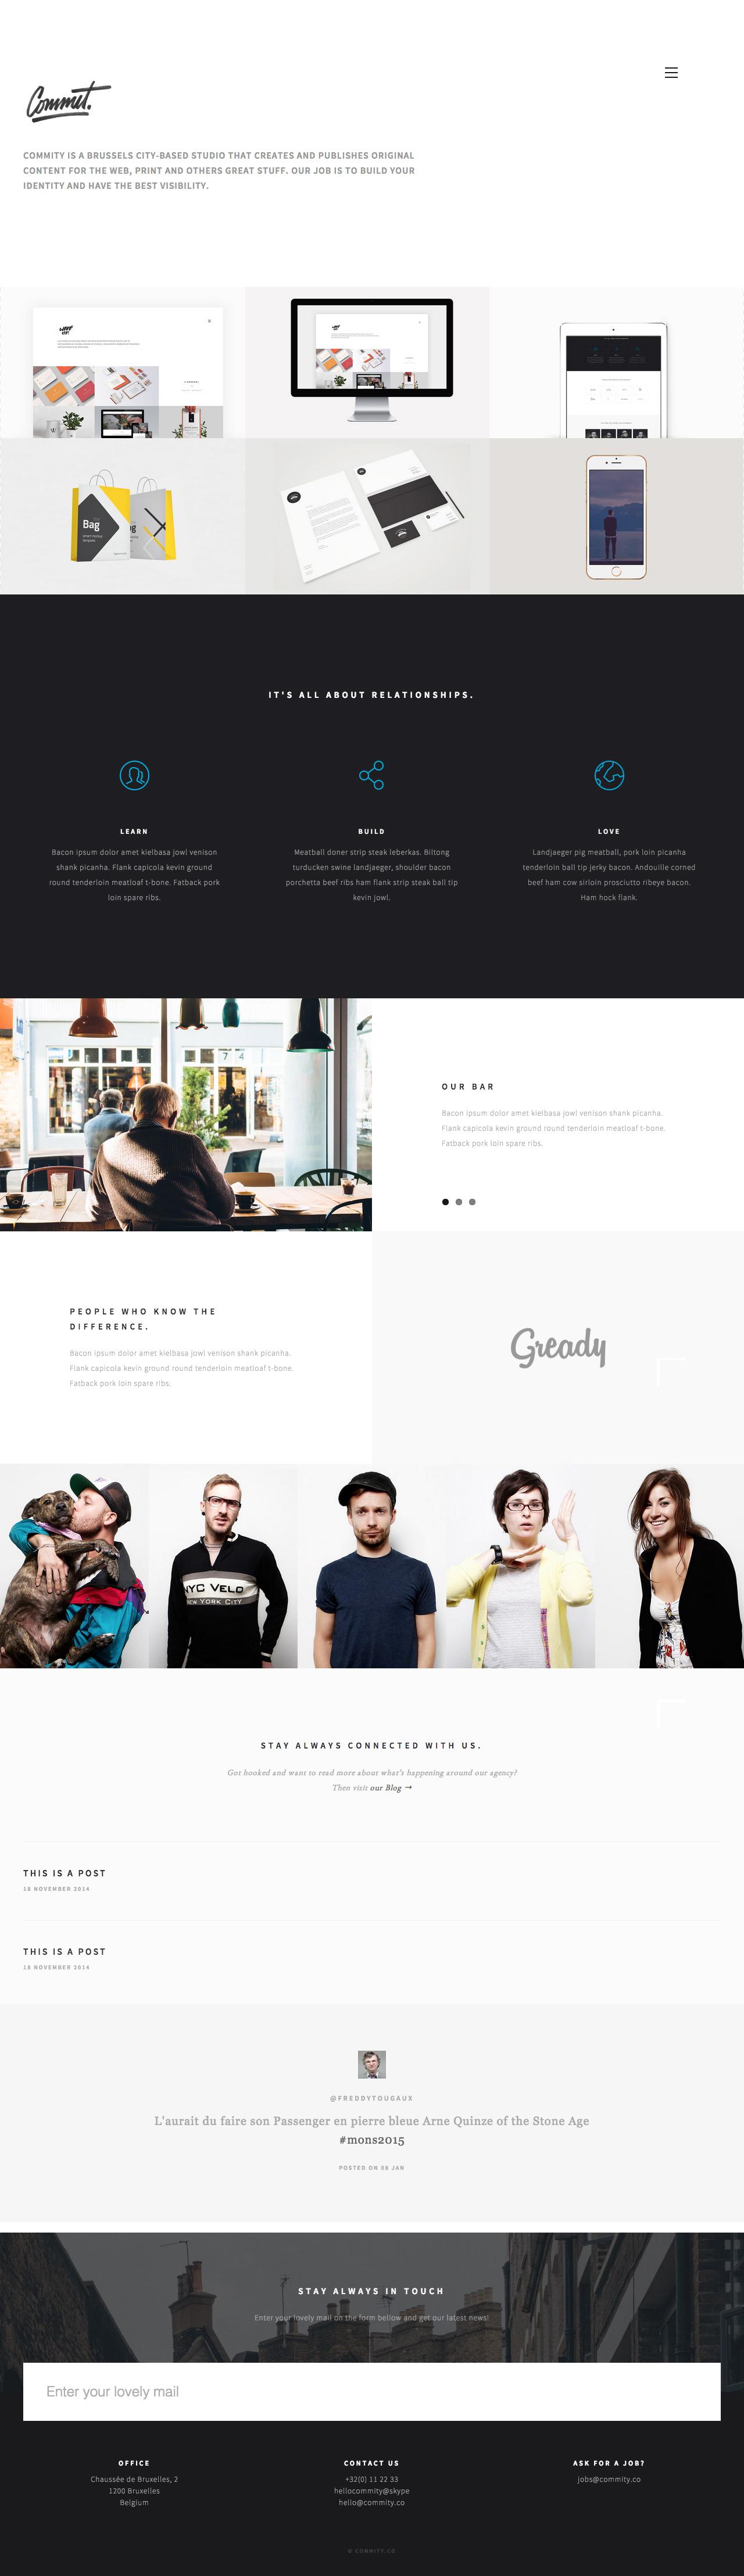 Commity Website Screenshot